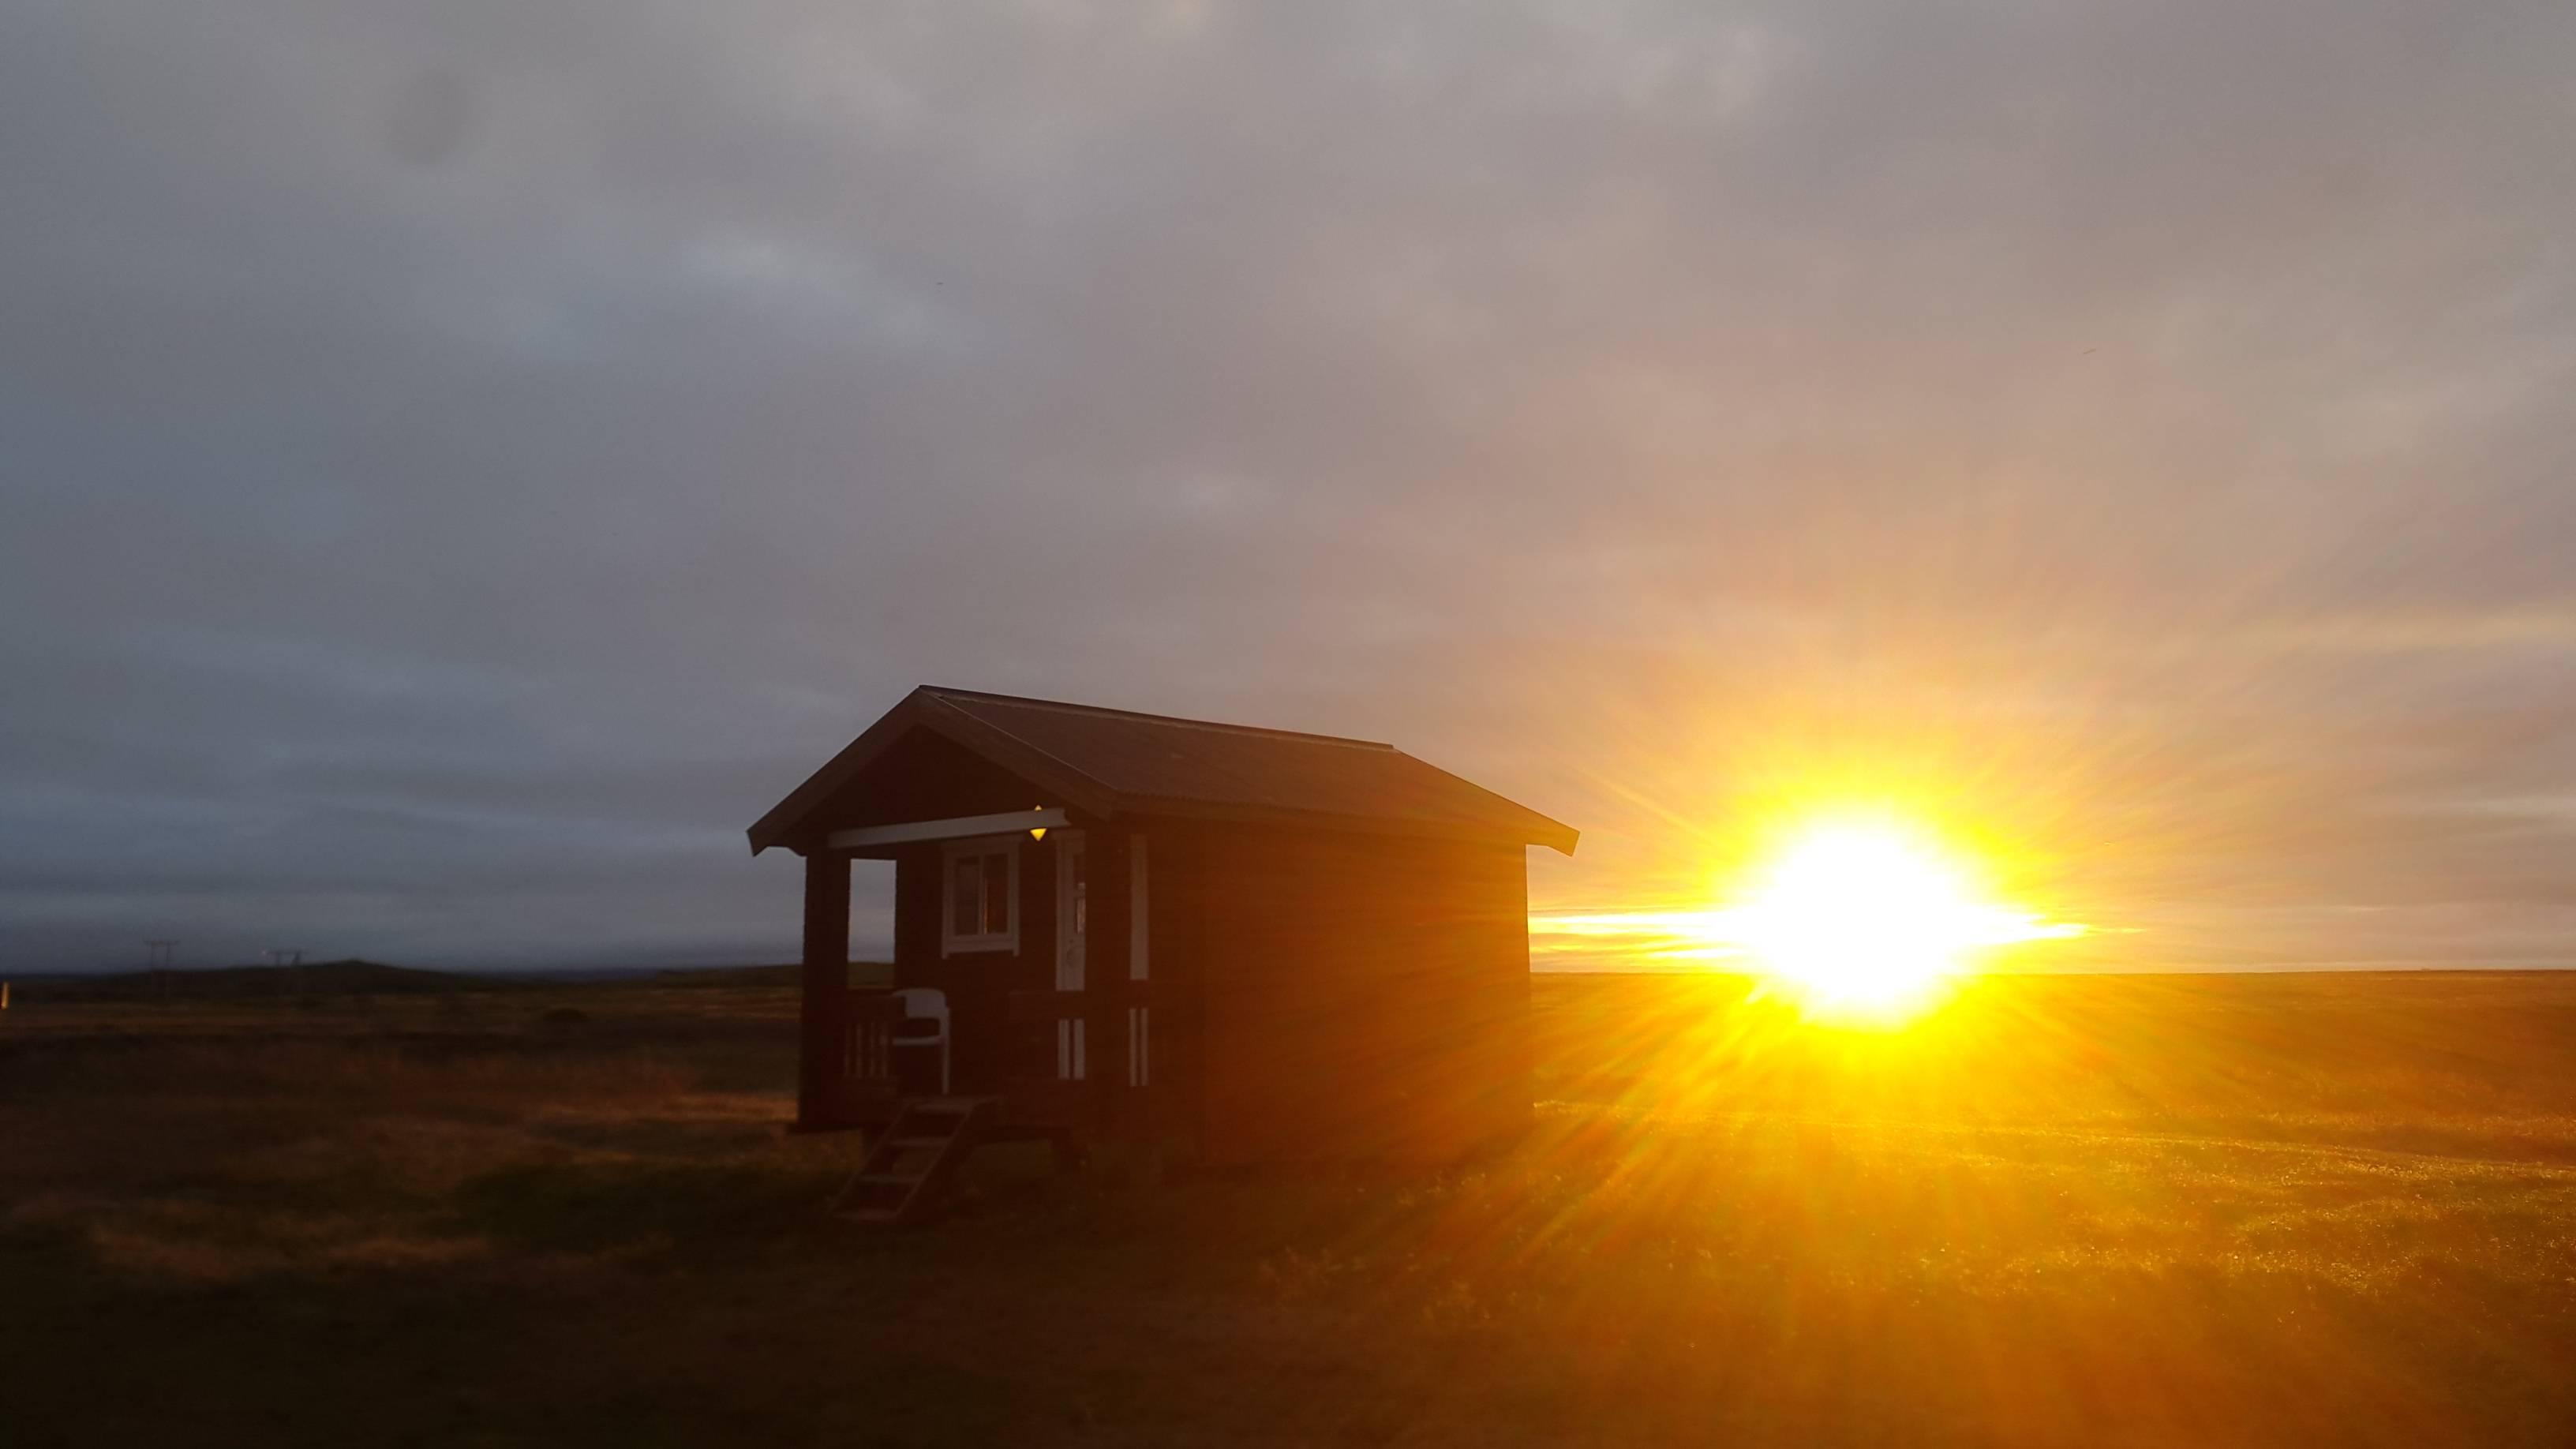 Photo 1: DETTIFOSS Nord Islande